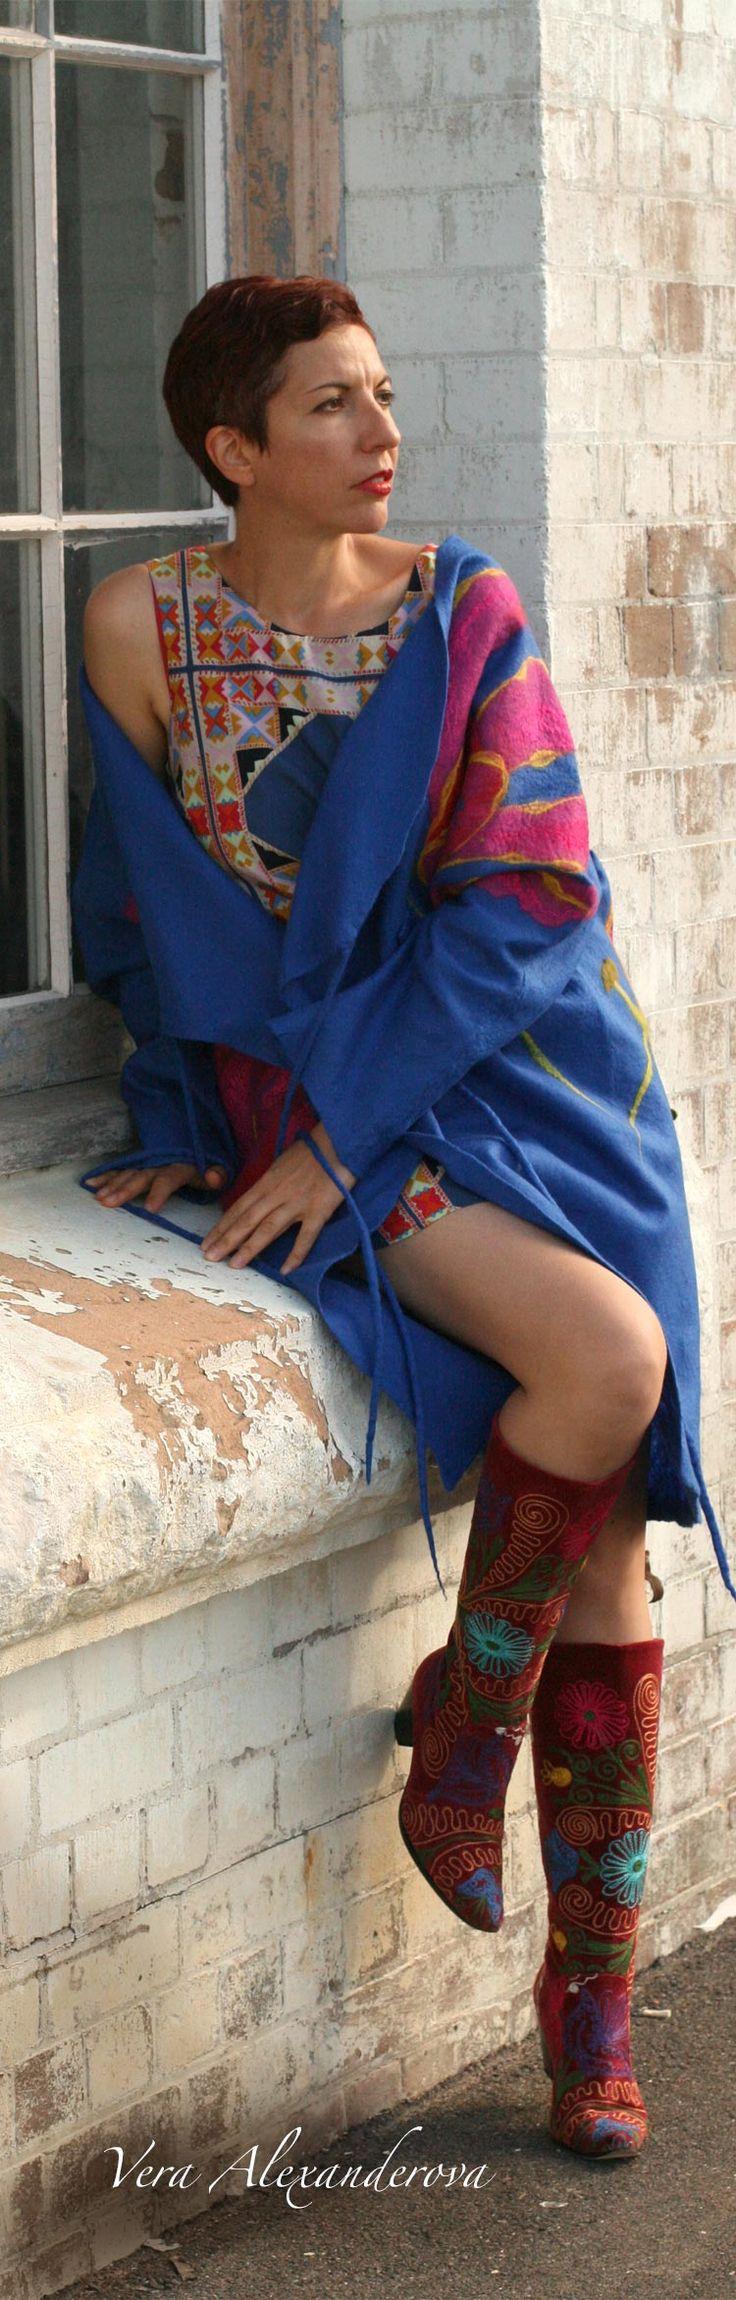 Buy fashion cozy style blue jacket by Vera Alexanderova. #fashion #boho #cozy #womensfashion #unique #felt #wool #blue